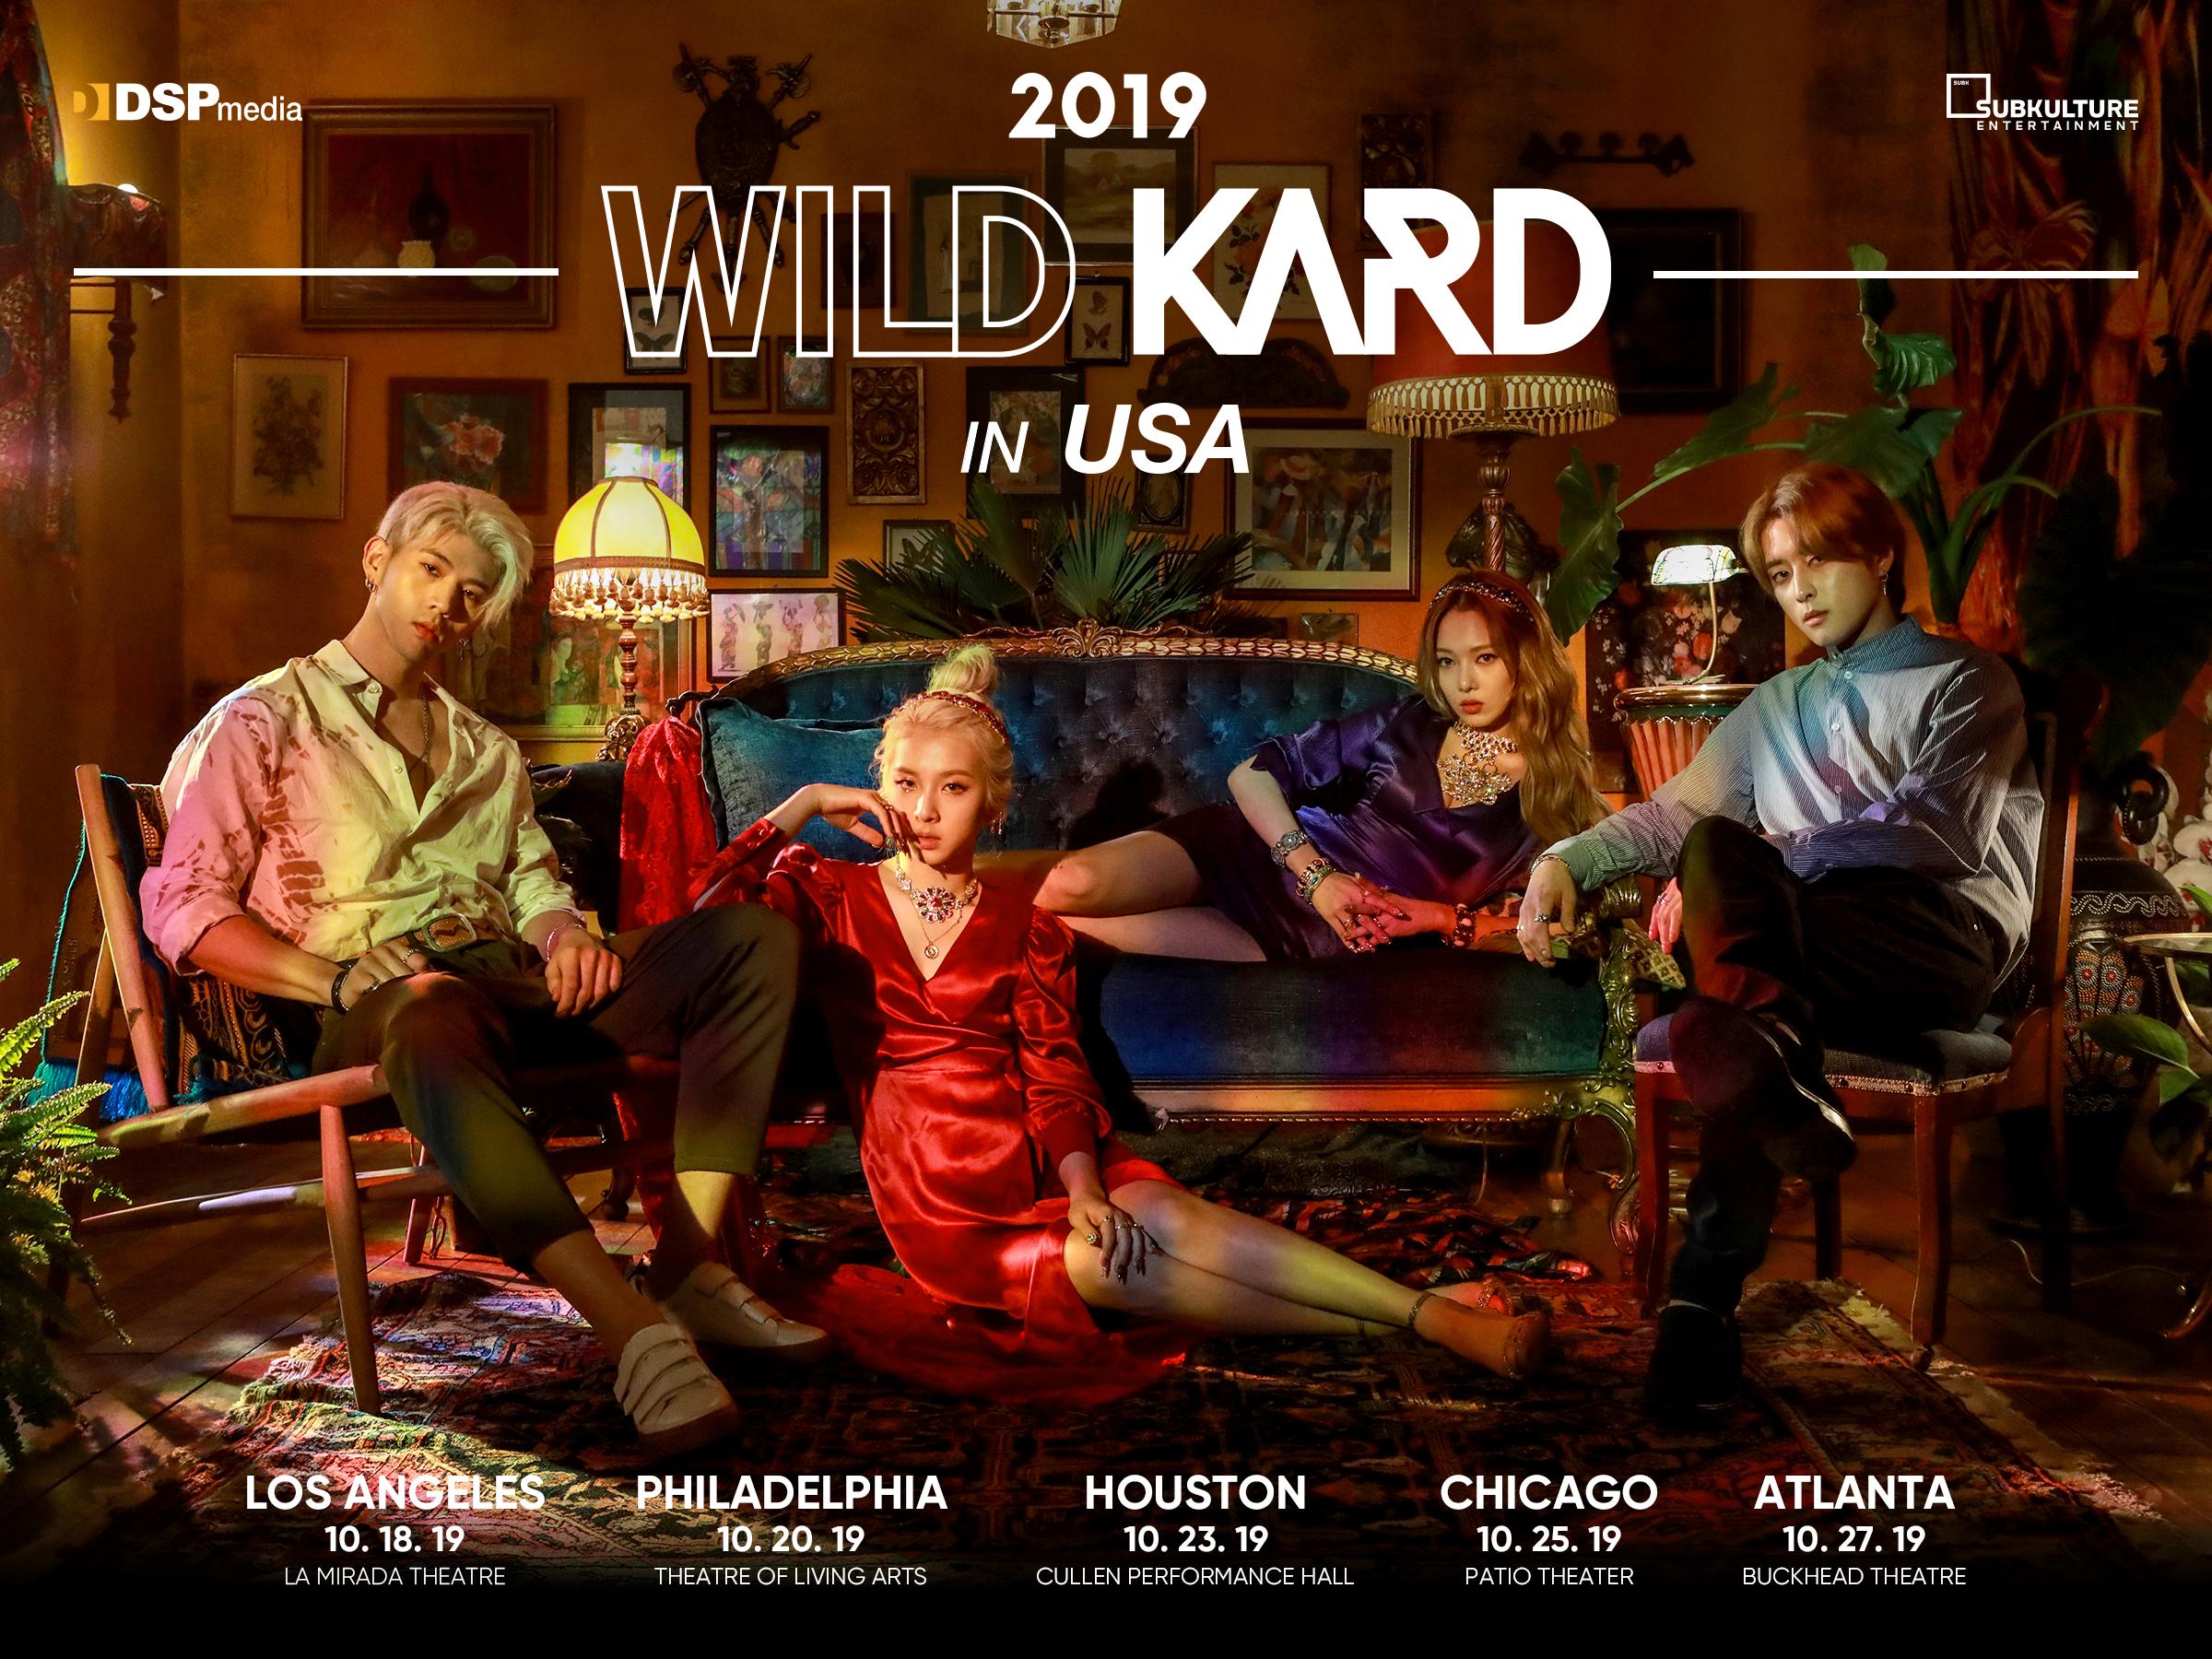 2019 WILD KARD TOUR IN USA Poster.png